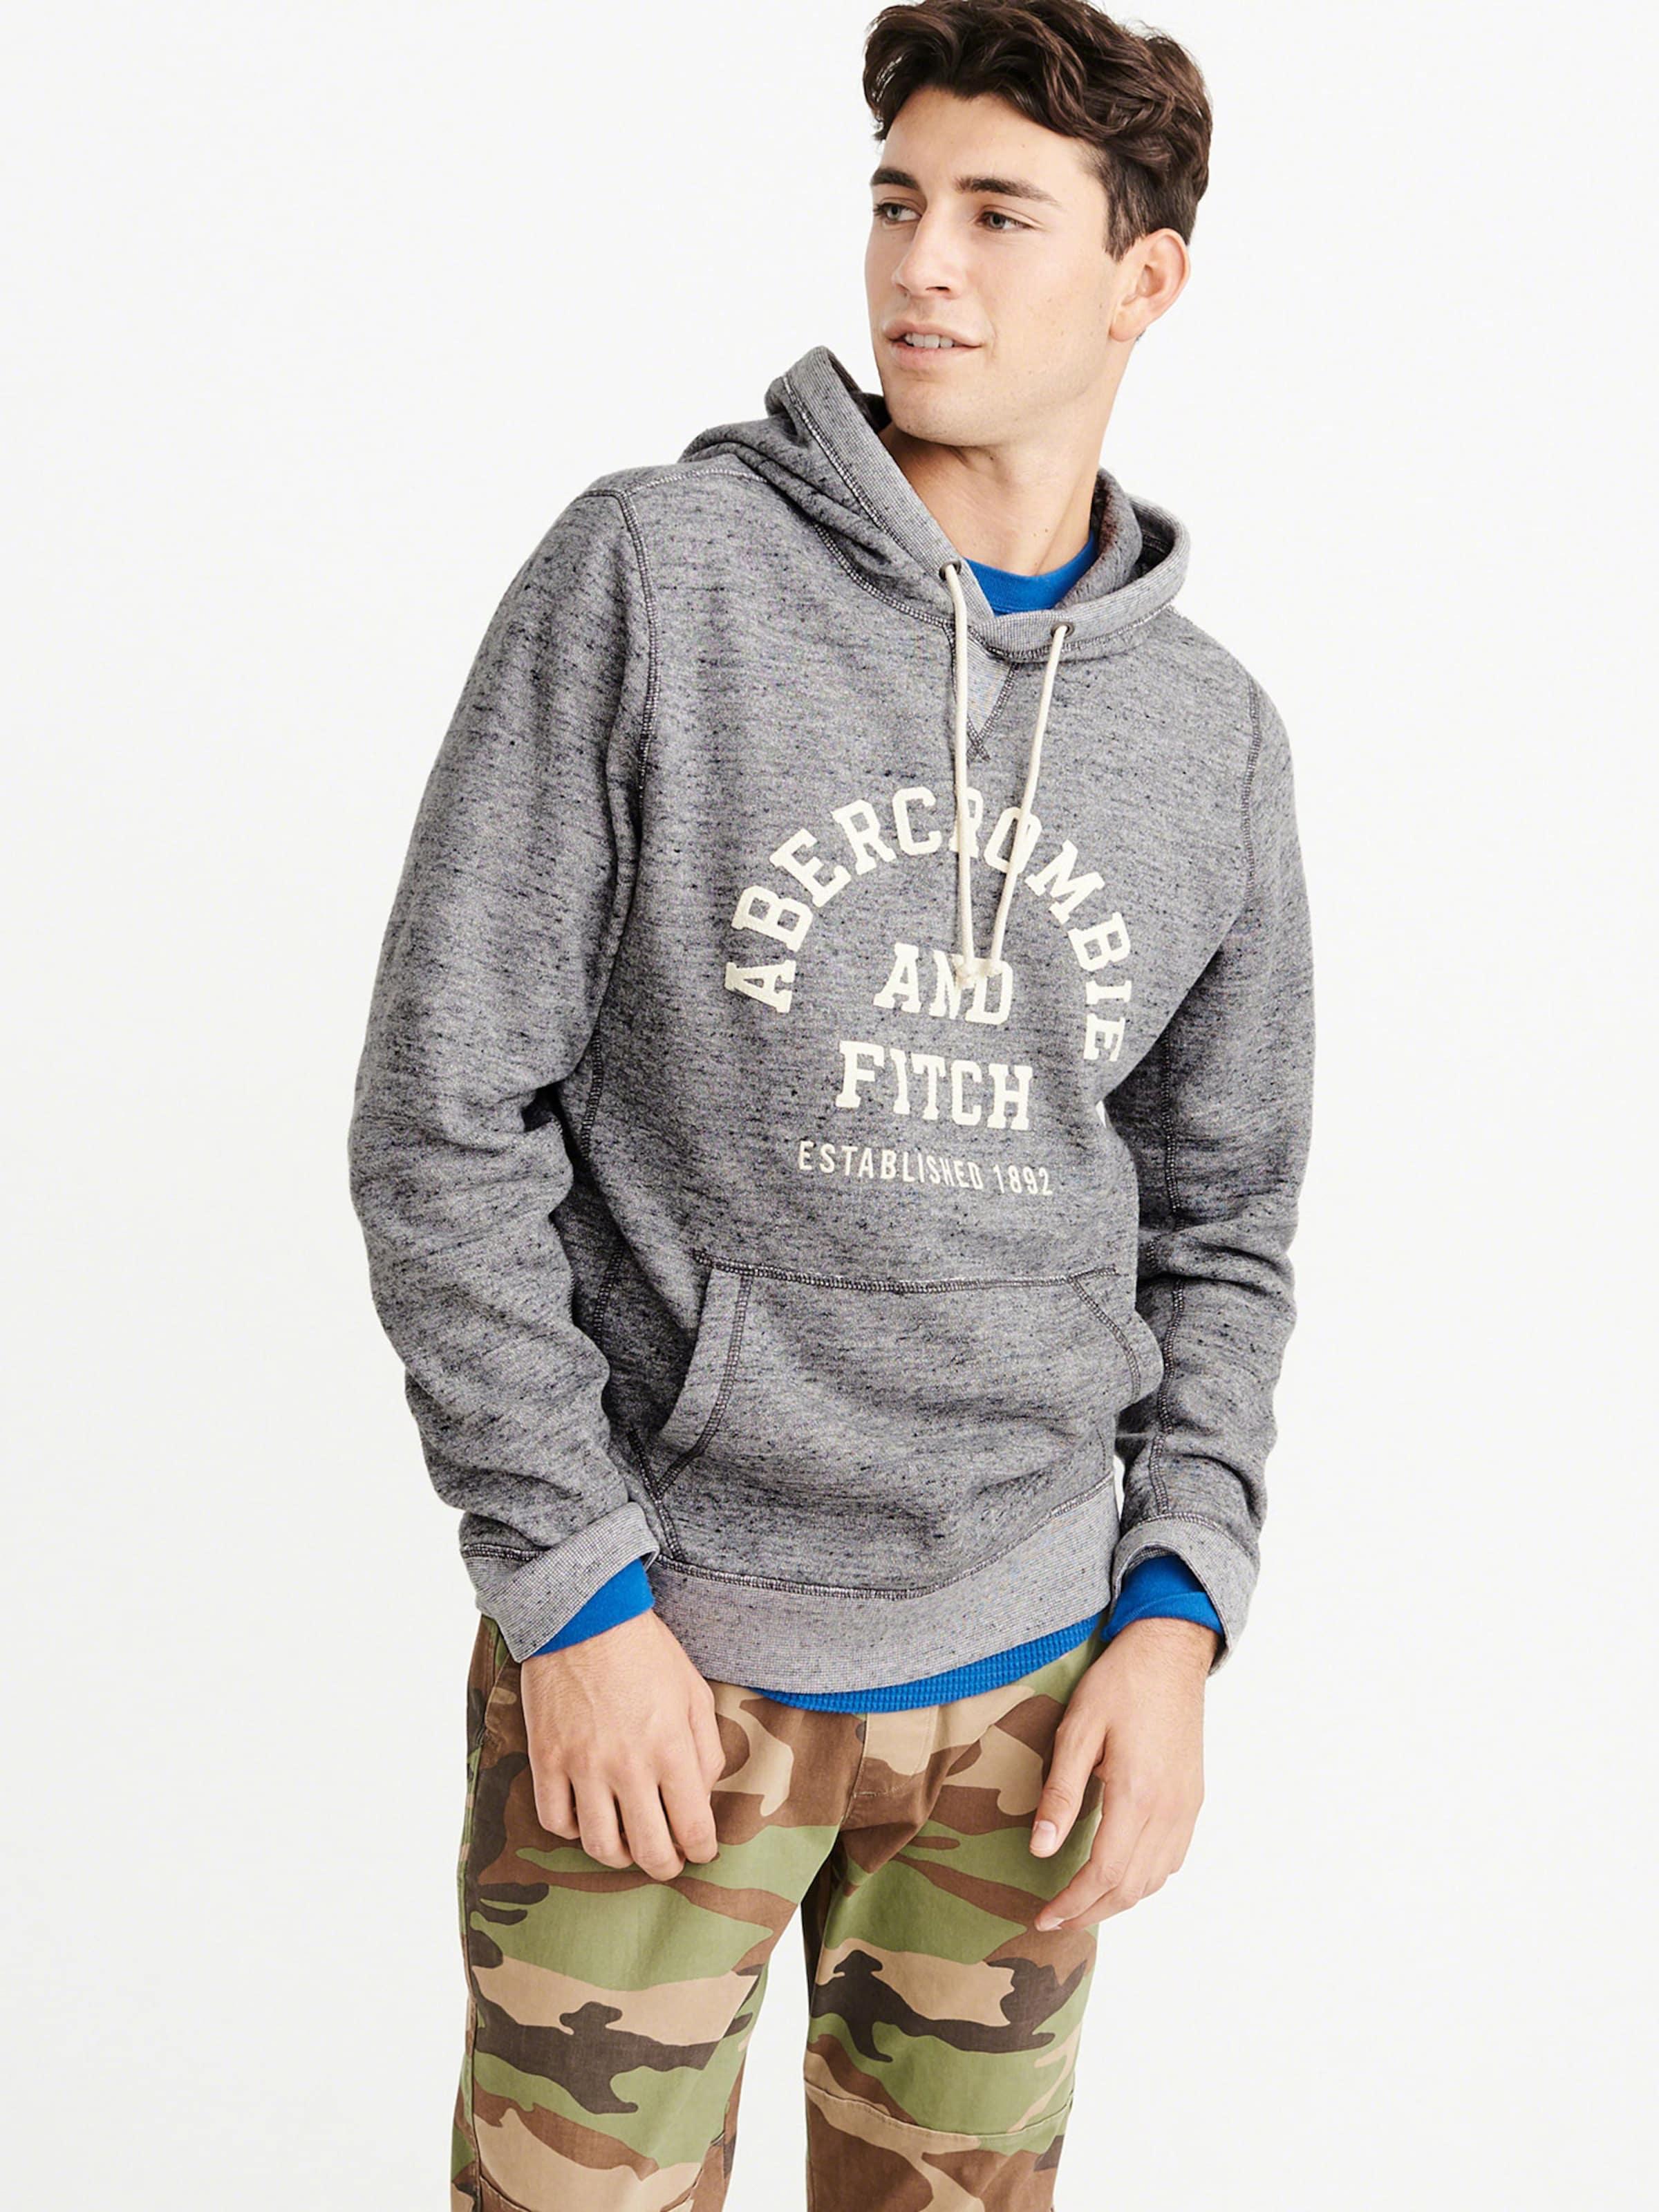 Popover Gris En Fitch shirt 'core Grey' Sweat Logo Abercrombieamp; 29YWEHID